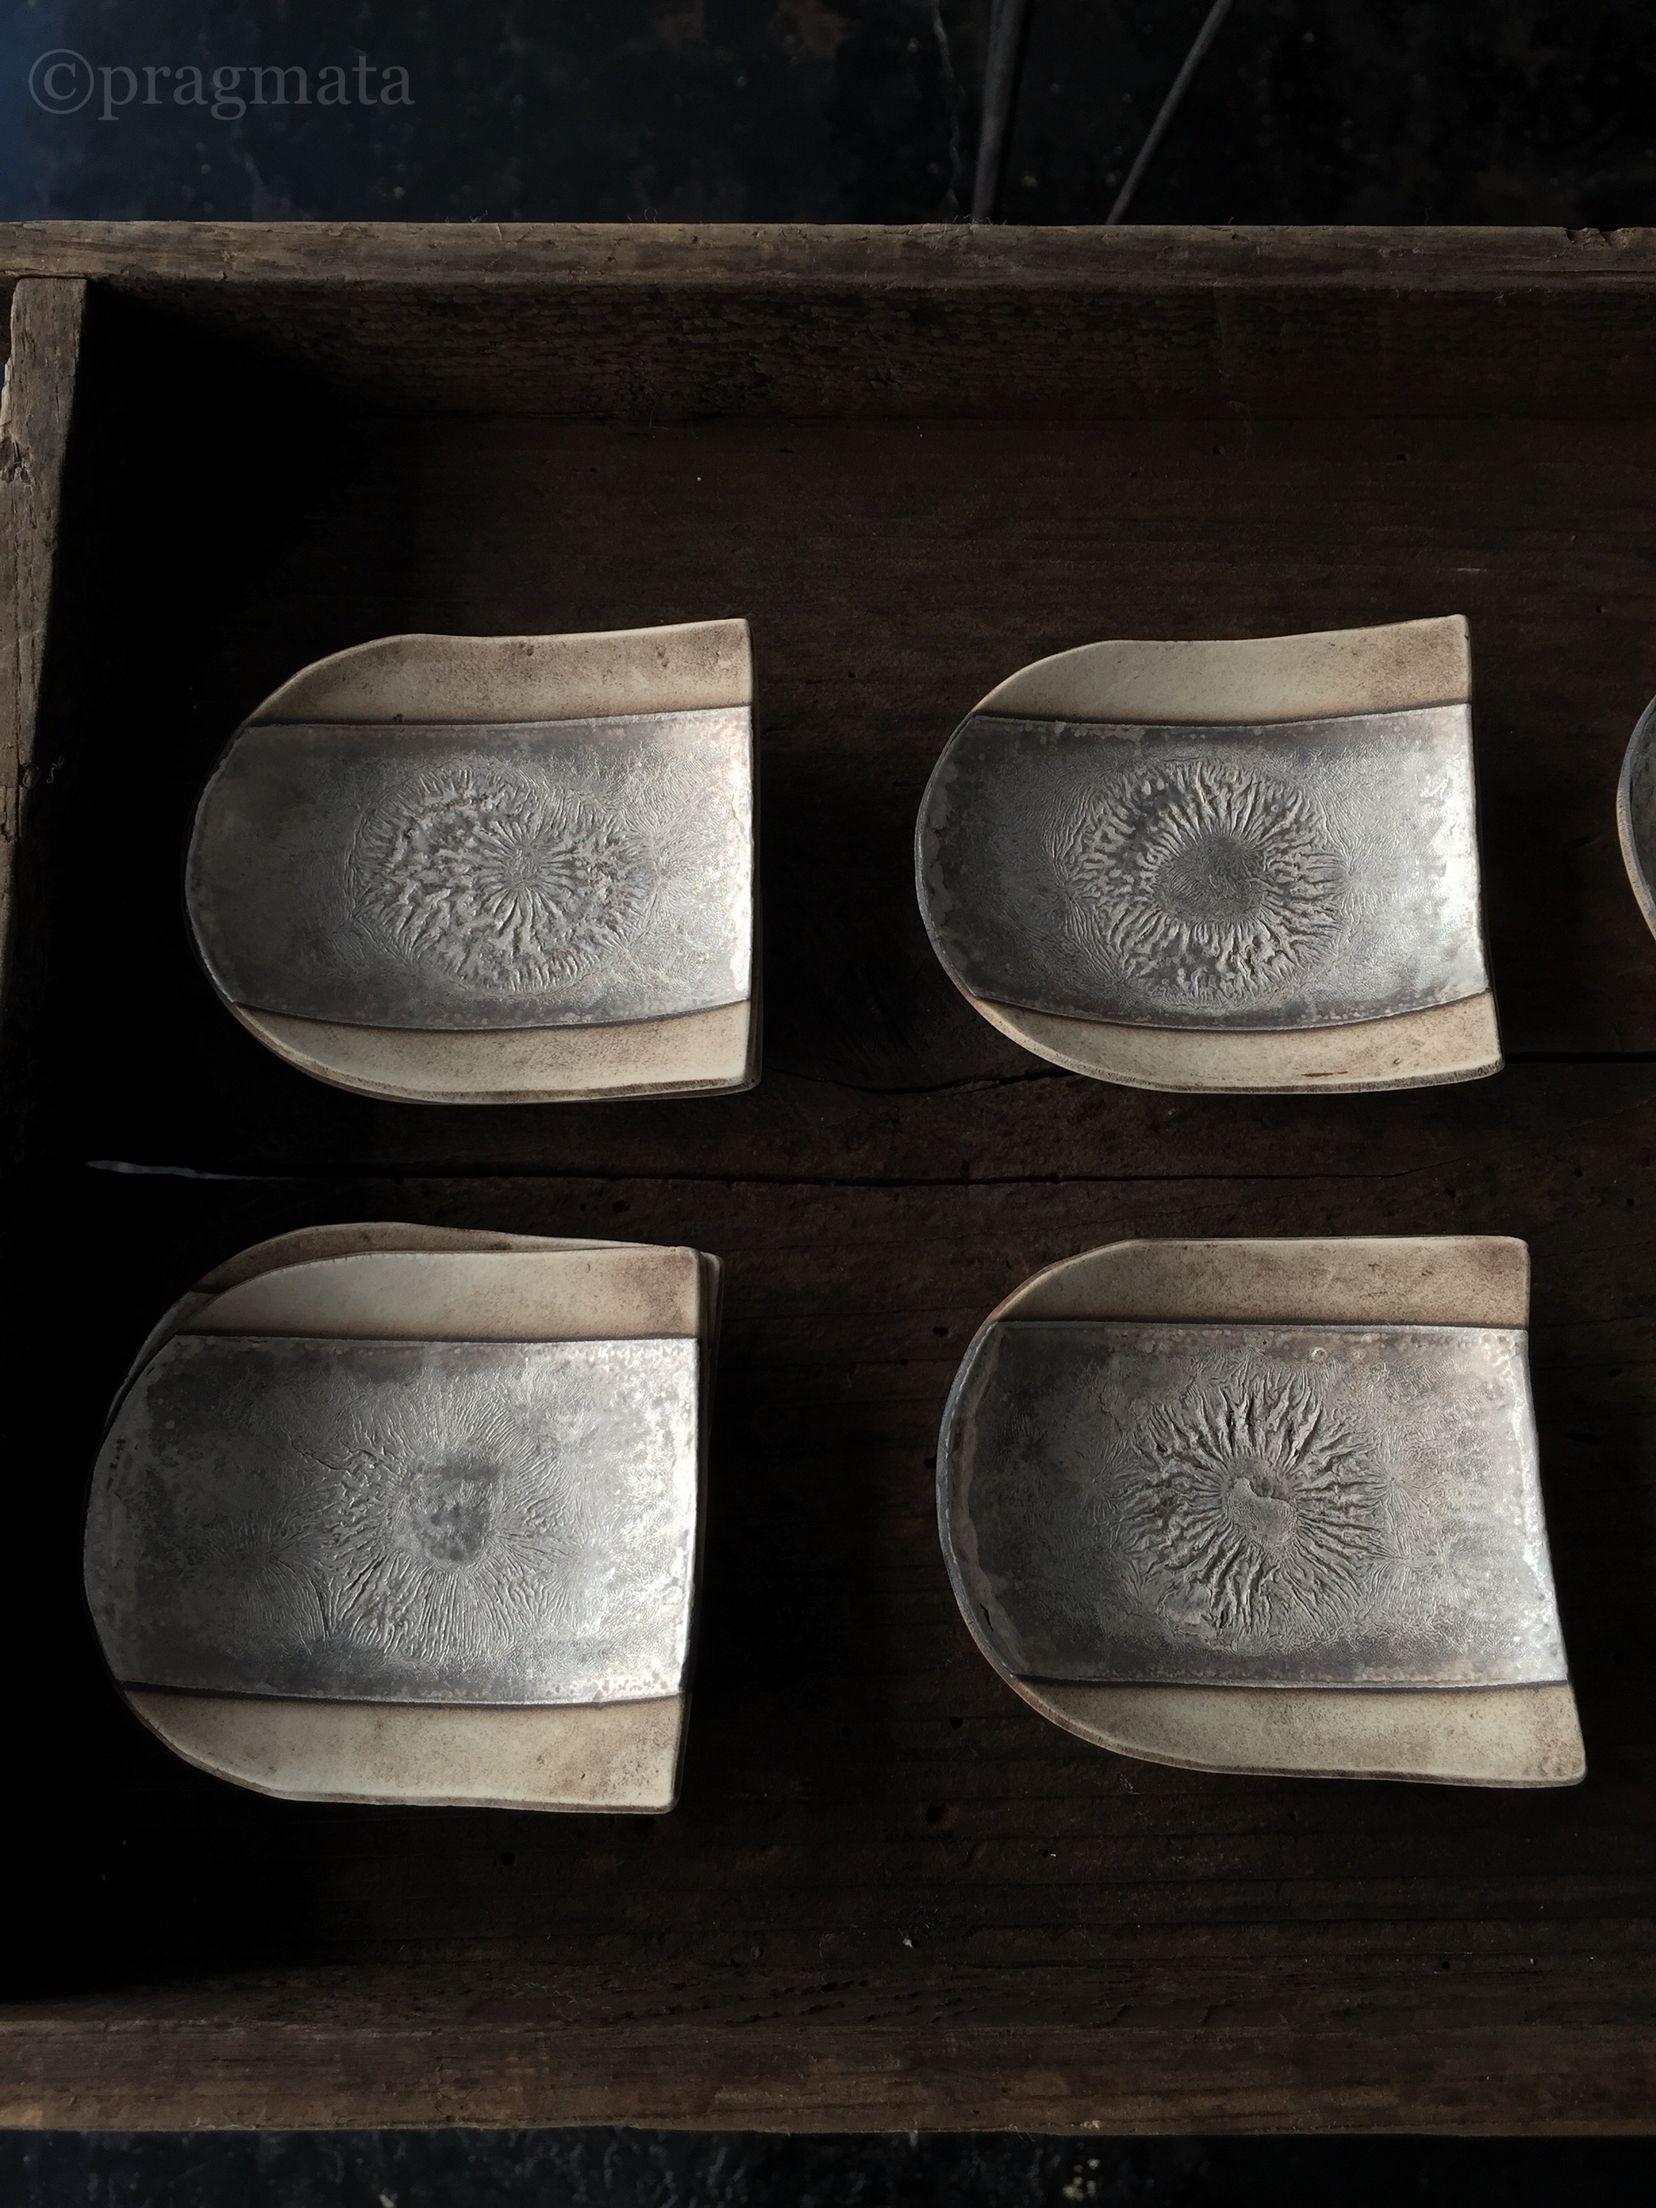 """Solar panels "" Ceramics by Ohmura Takeshi 『ソーラーパネル」 陶器、大村剛 #pragmata"